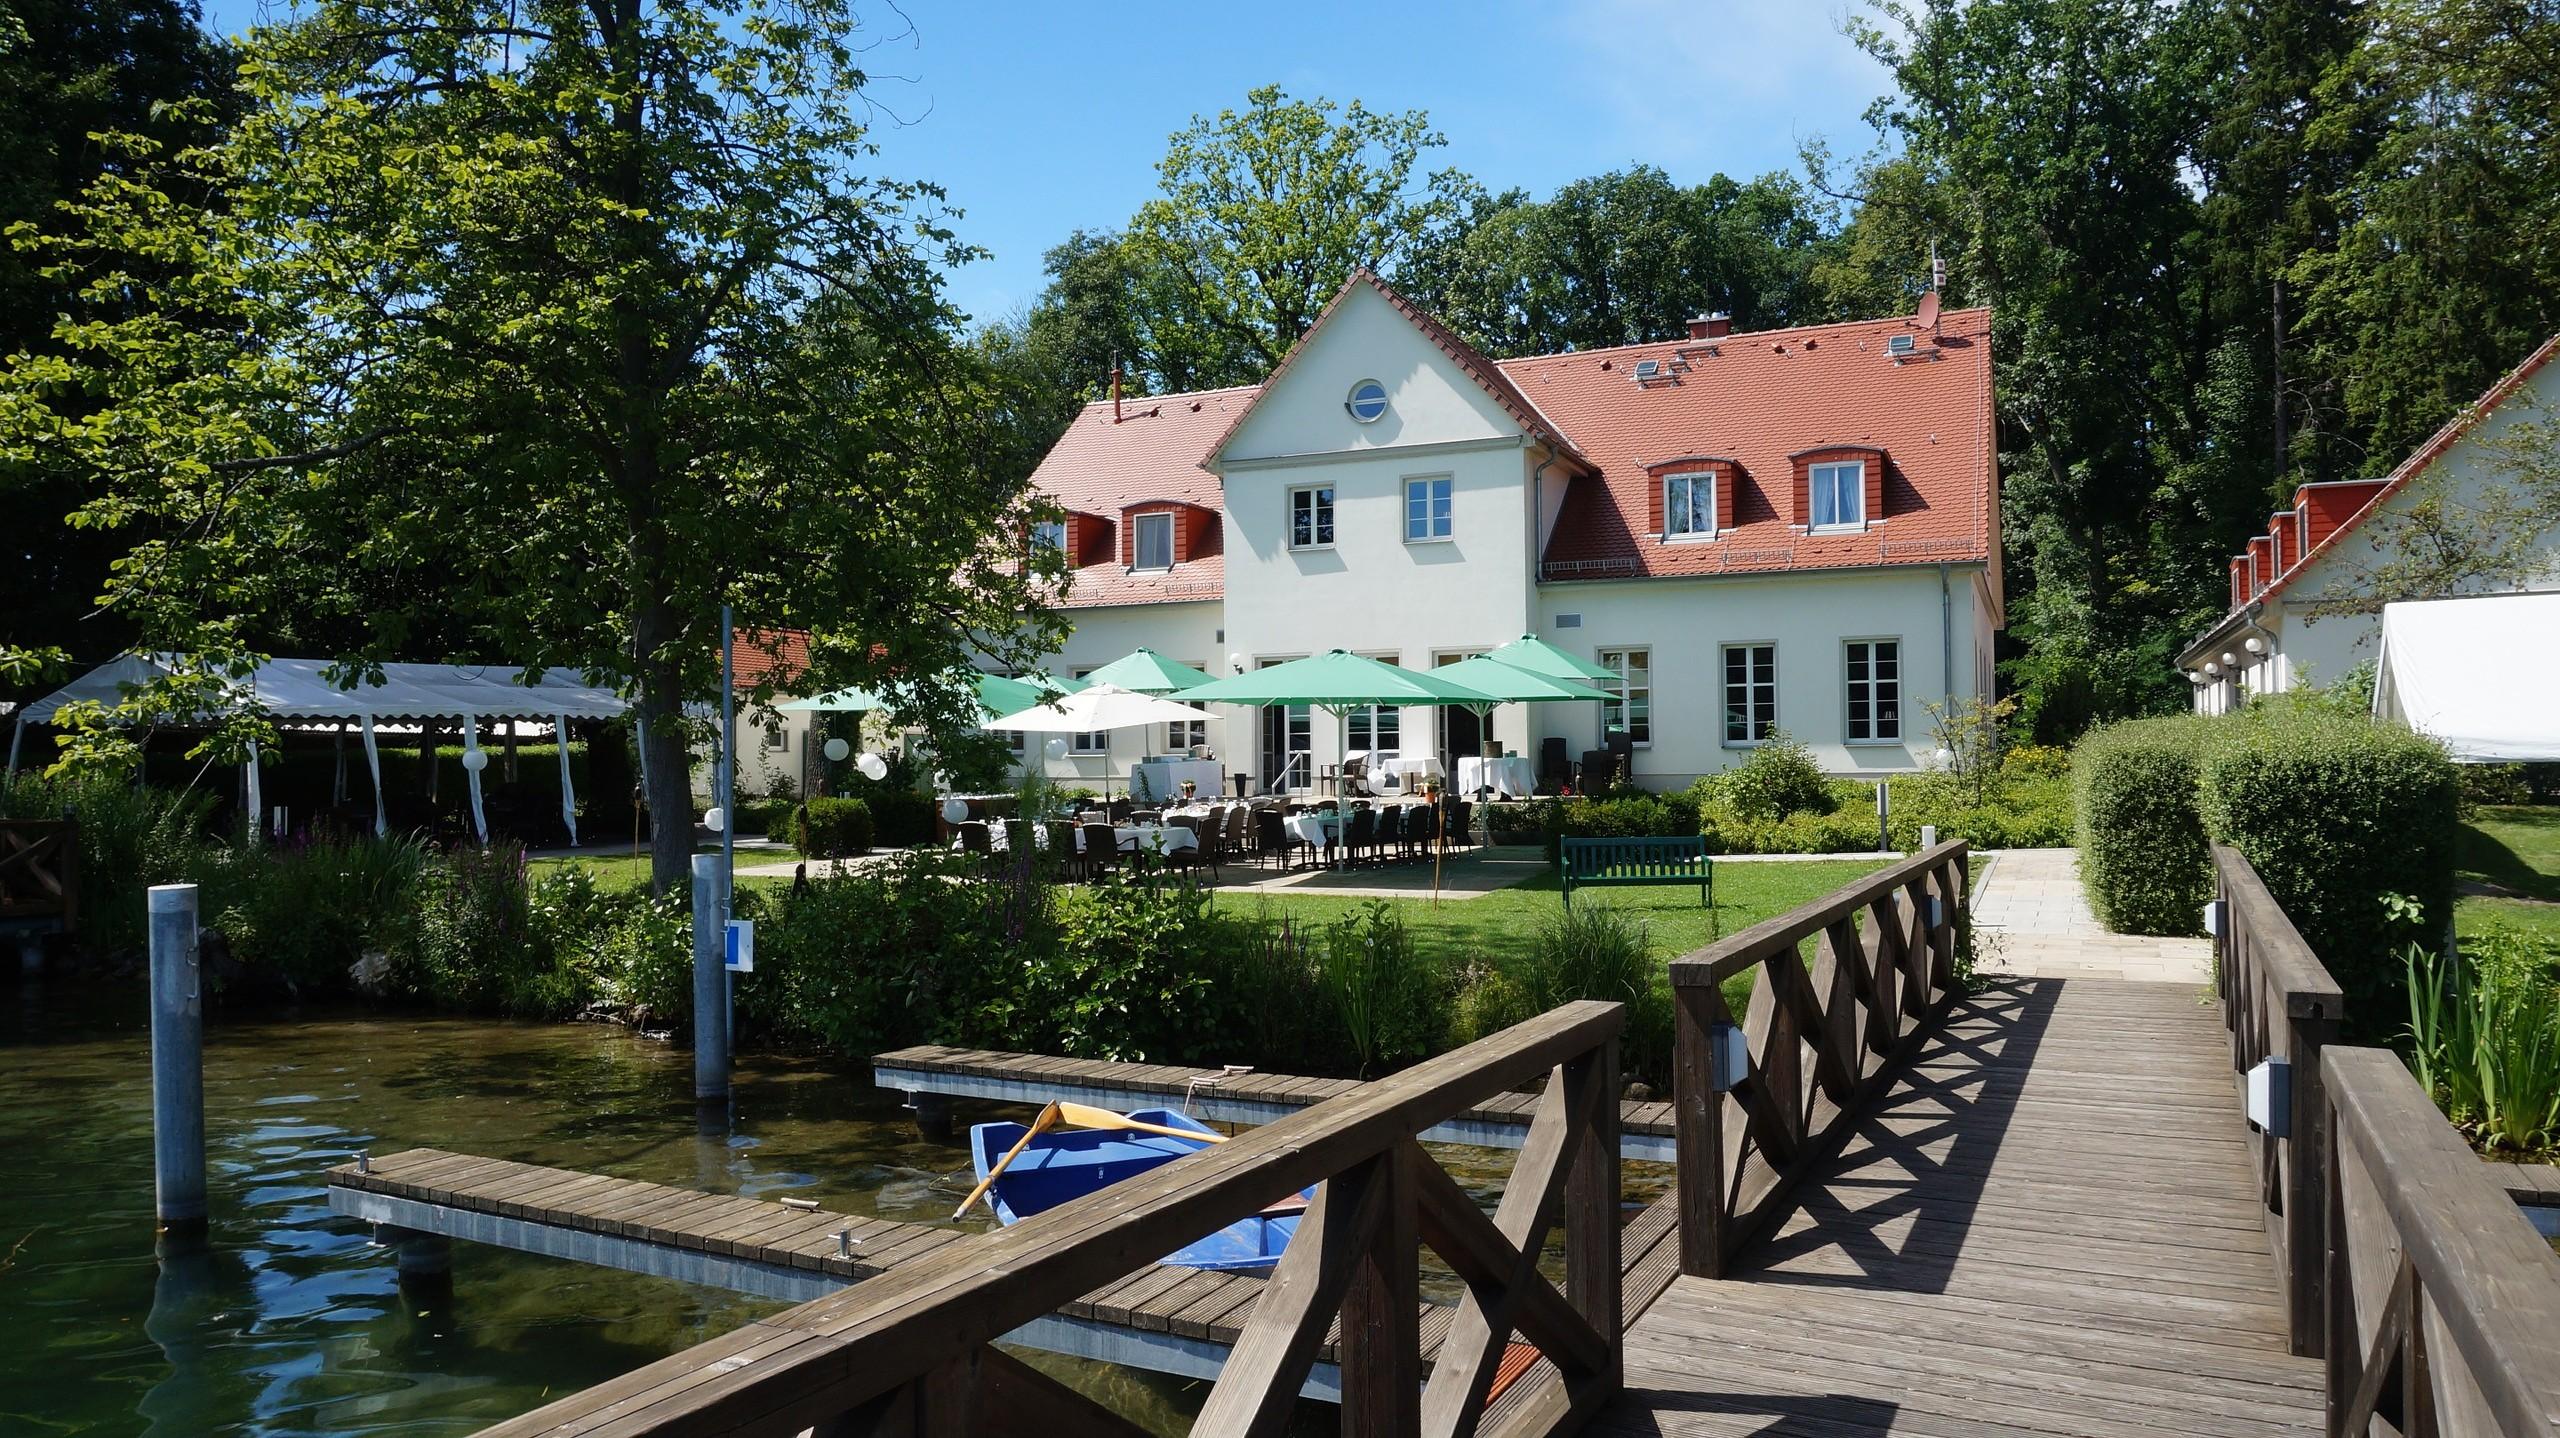 restaurant caf wildau hotel restaurant am werbellinsee barnimer land eichhorst. Black Bedroom Furniture Sets. Home Design Ideas